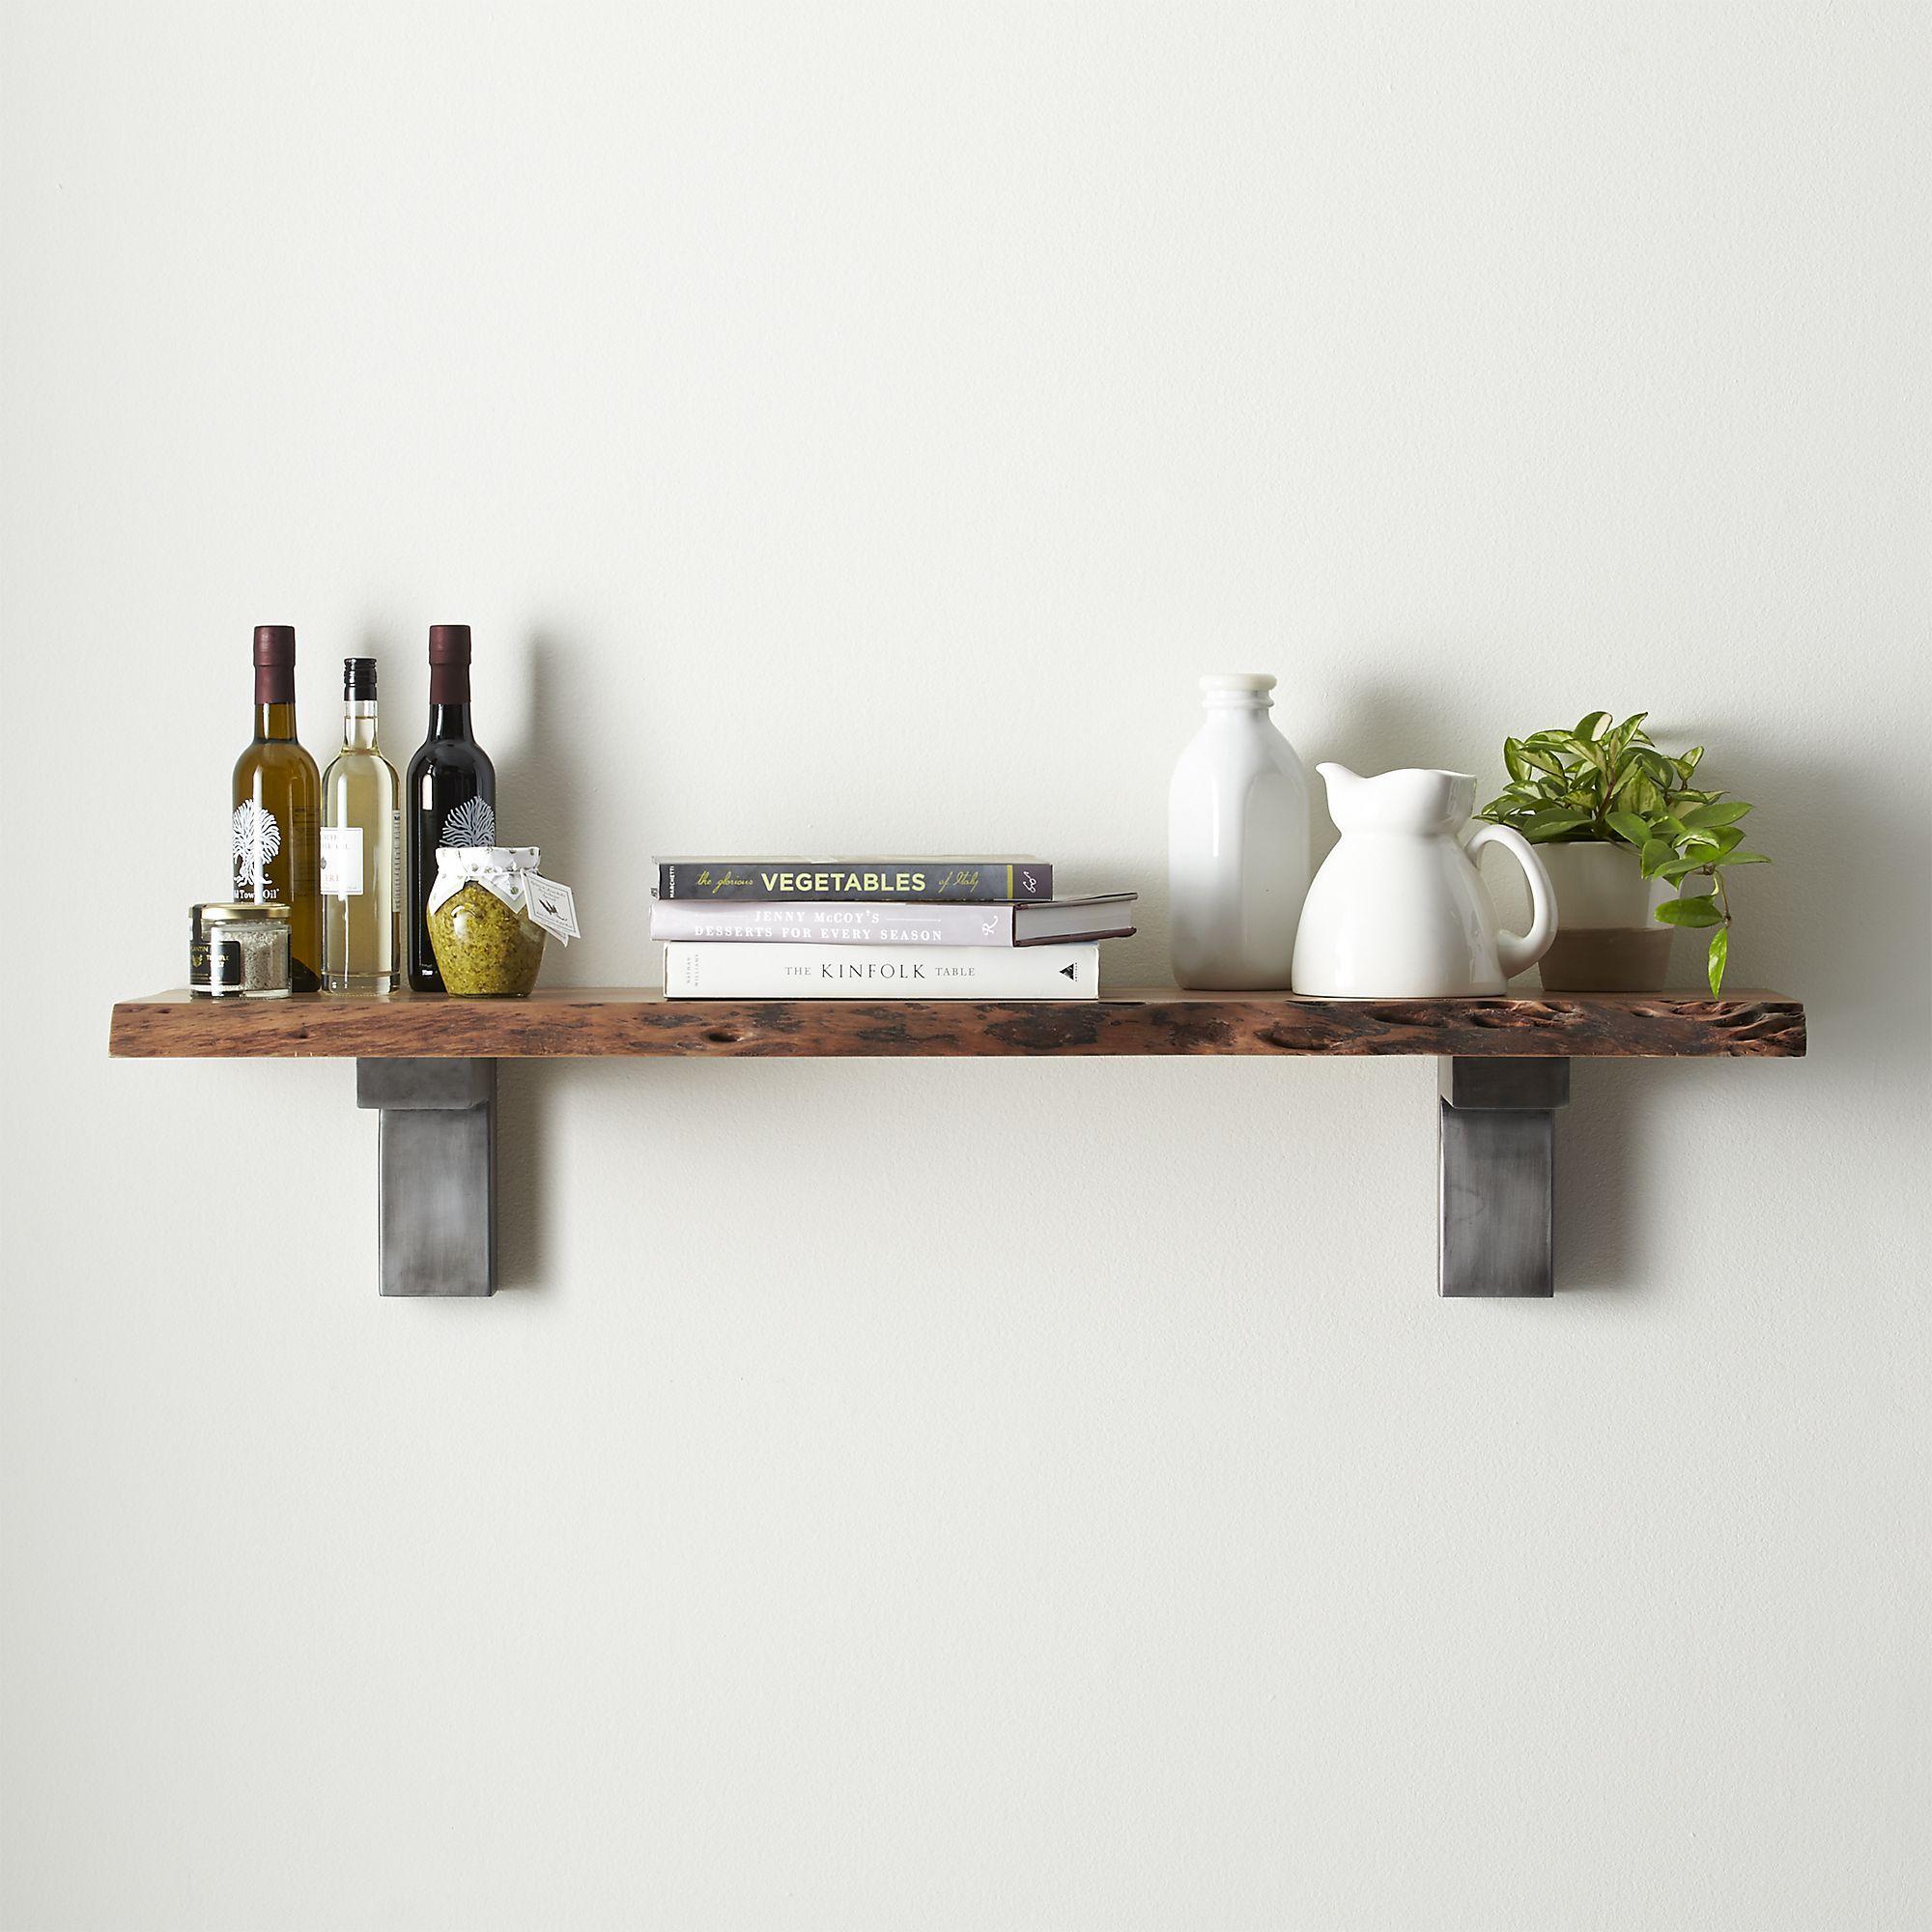 salton wall shelf crate and barrel ideas for the basement wall rh pinterest com  crate and barrel bathroom wall shelf